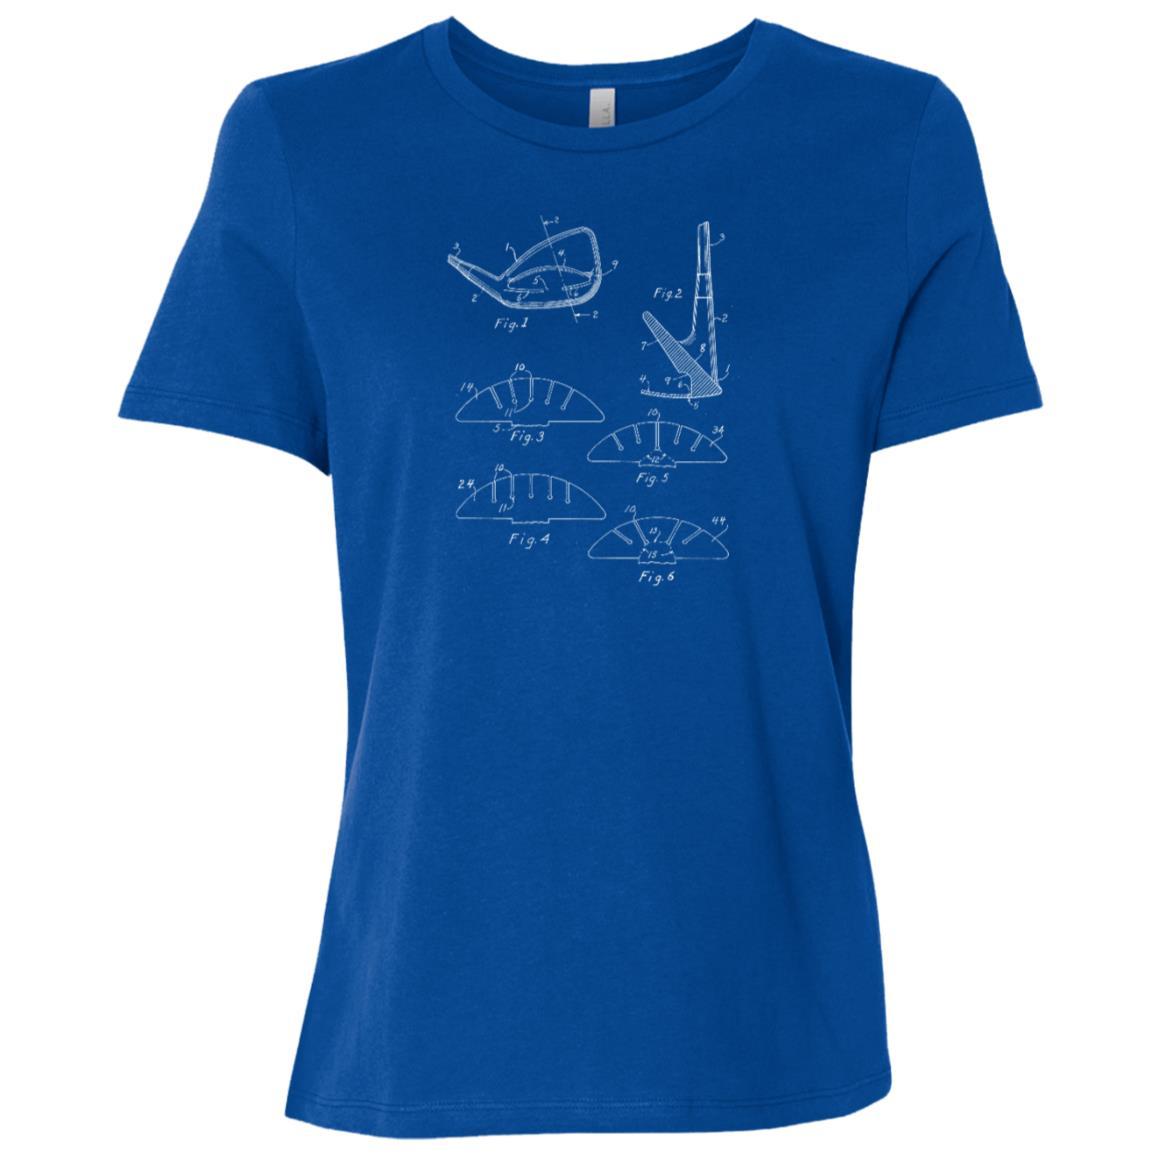 Golf Club Vintage Patent Drawing Funny Novelty -2 Women Short Sleeve T-Shirt